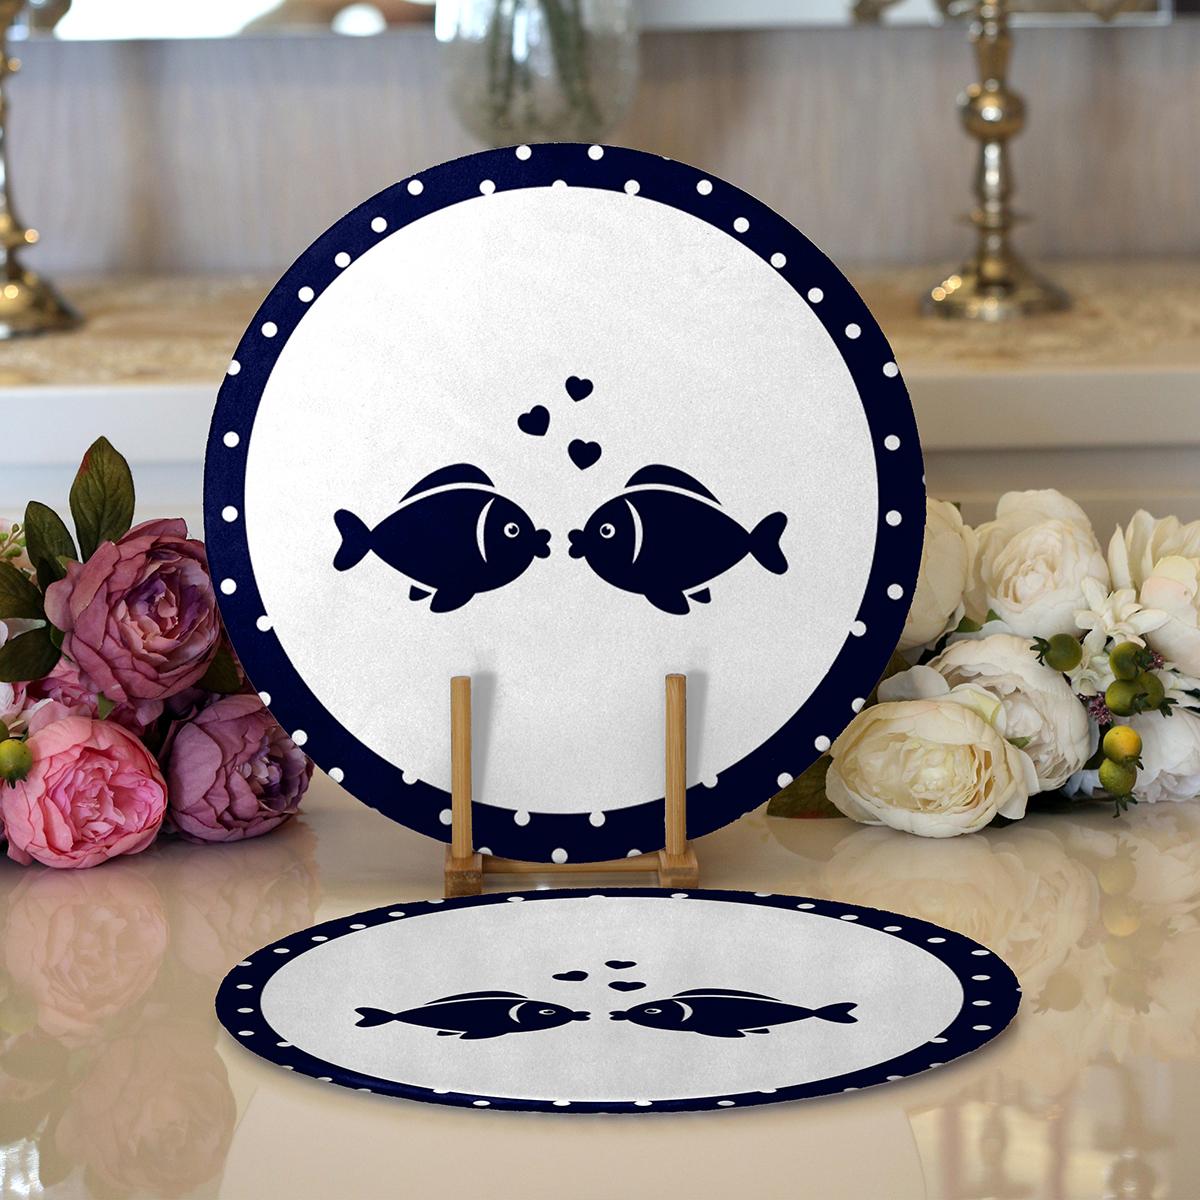 Realhomes Beyaz Zemin Üzerinde Renkli Balık Desenli 2'li Yuvarlak Servis Altlığı - Supla Realhomes